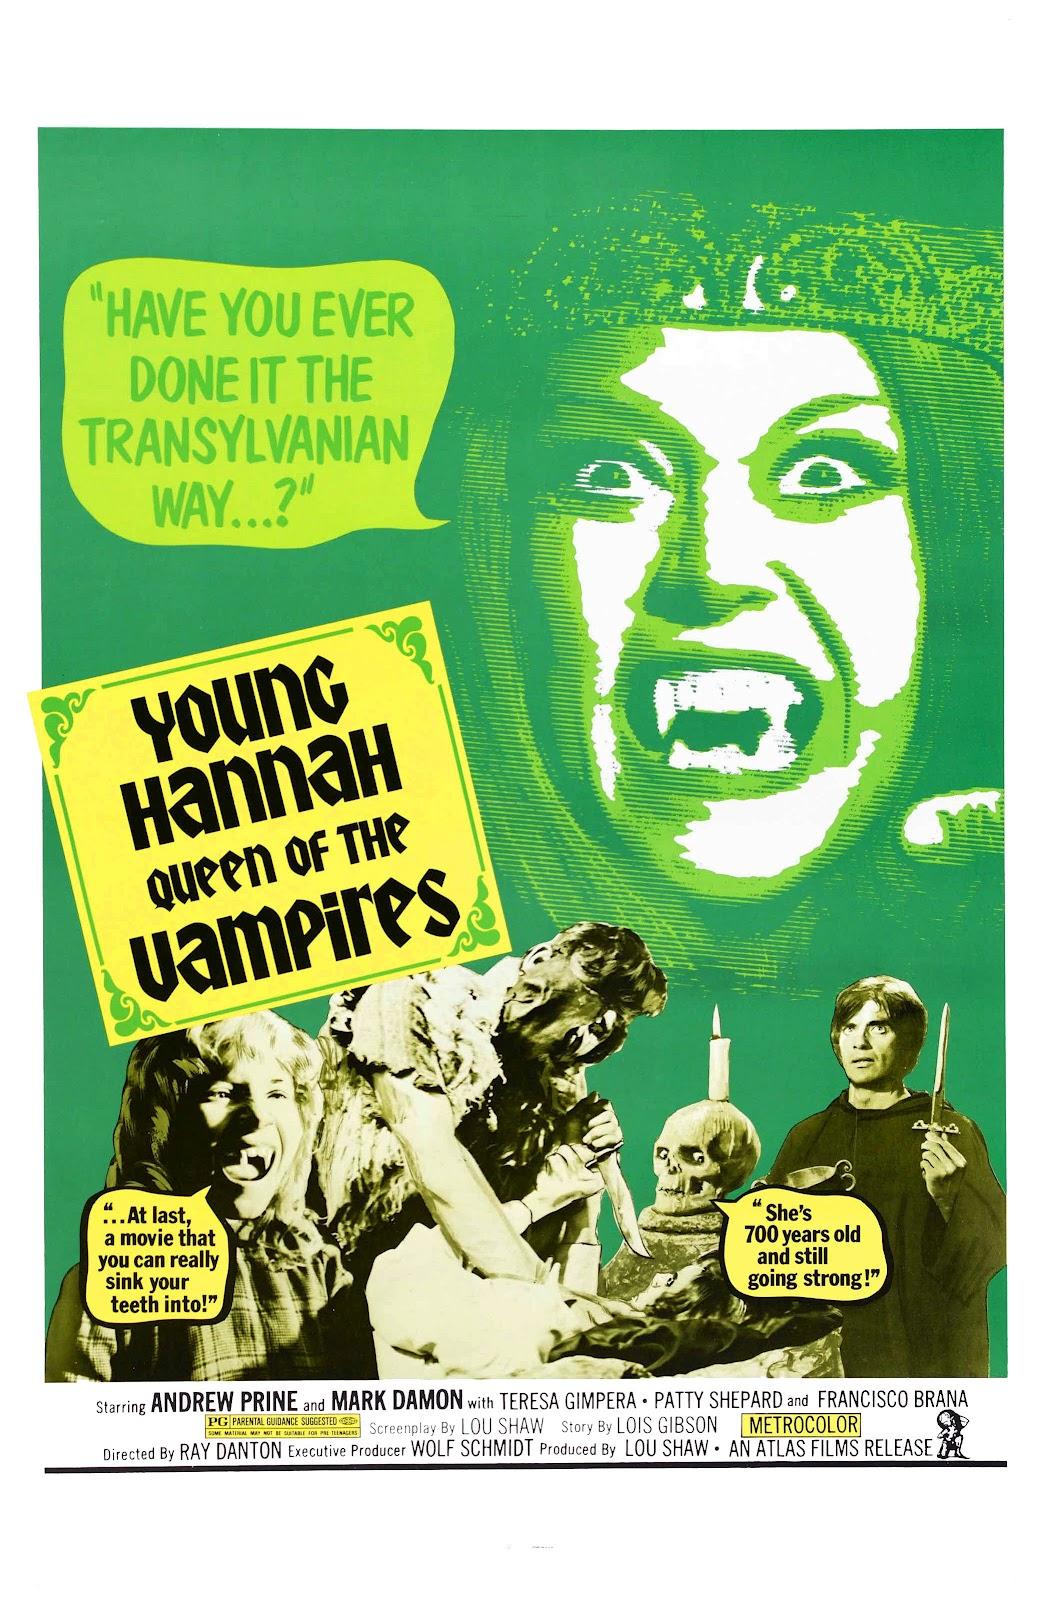 http://3.bp.blogspot.com/-FO1bUUlRbqc/T1Ntf-F4XoI/AAAAAAAAAW4/cm4fSY8IJ8U/s1600/young_hannah_queen_of_vampires_poster_01.jpg